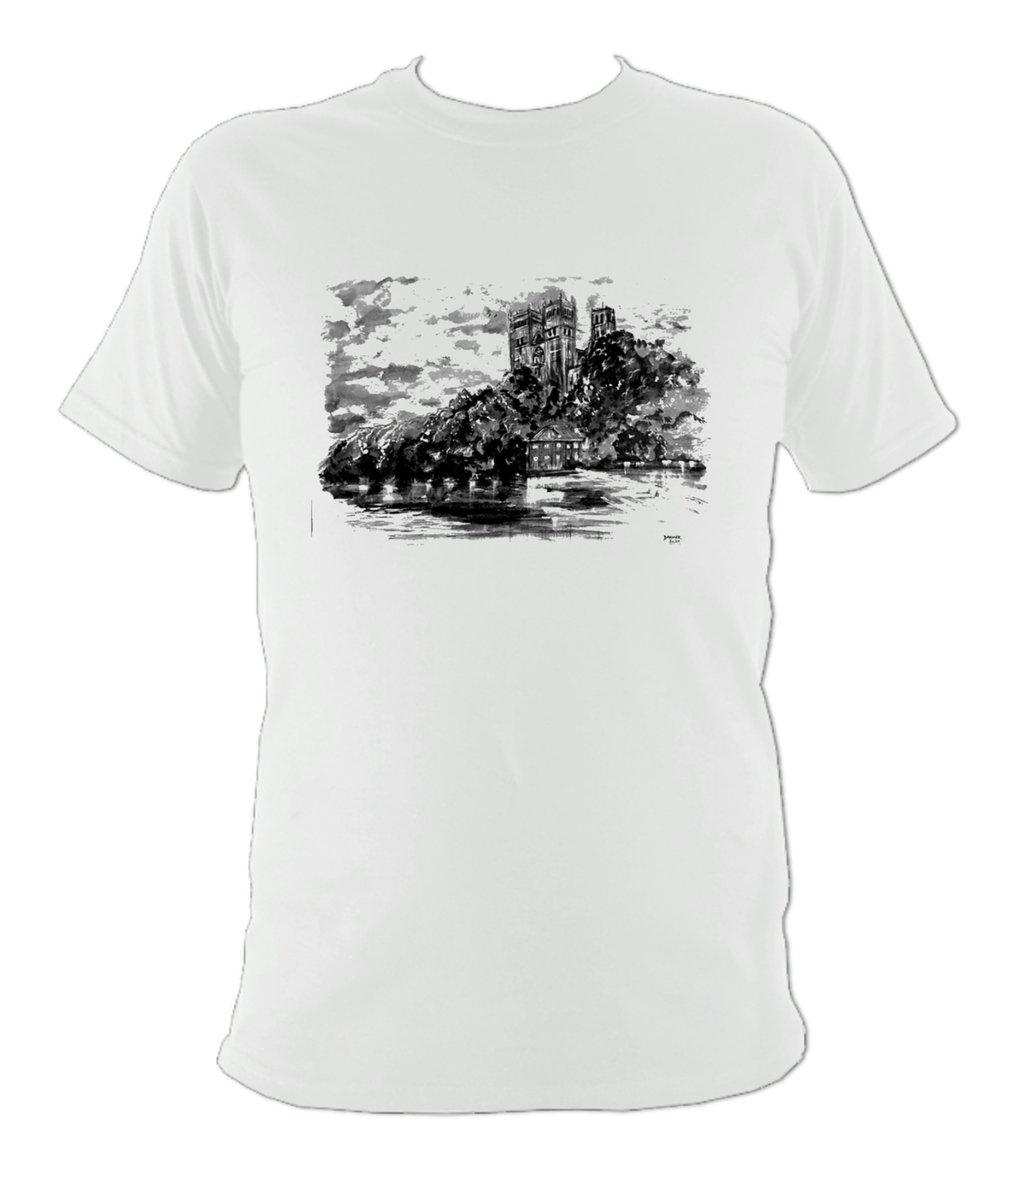 DMB Tee design 'I love Durham' Available from ArtsofDMB £15.00 + £1.94 std uk postage #tshirtdesign #tshirt  #tshirts #durhamcathedral #durham @durhamcathedral